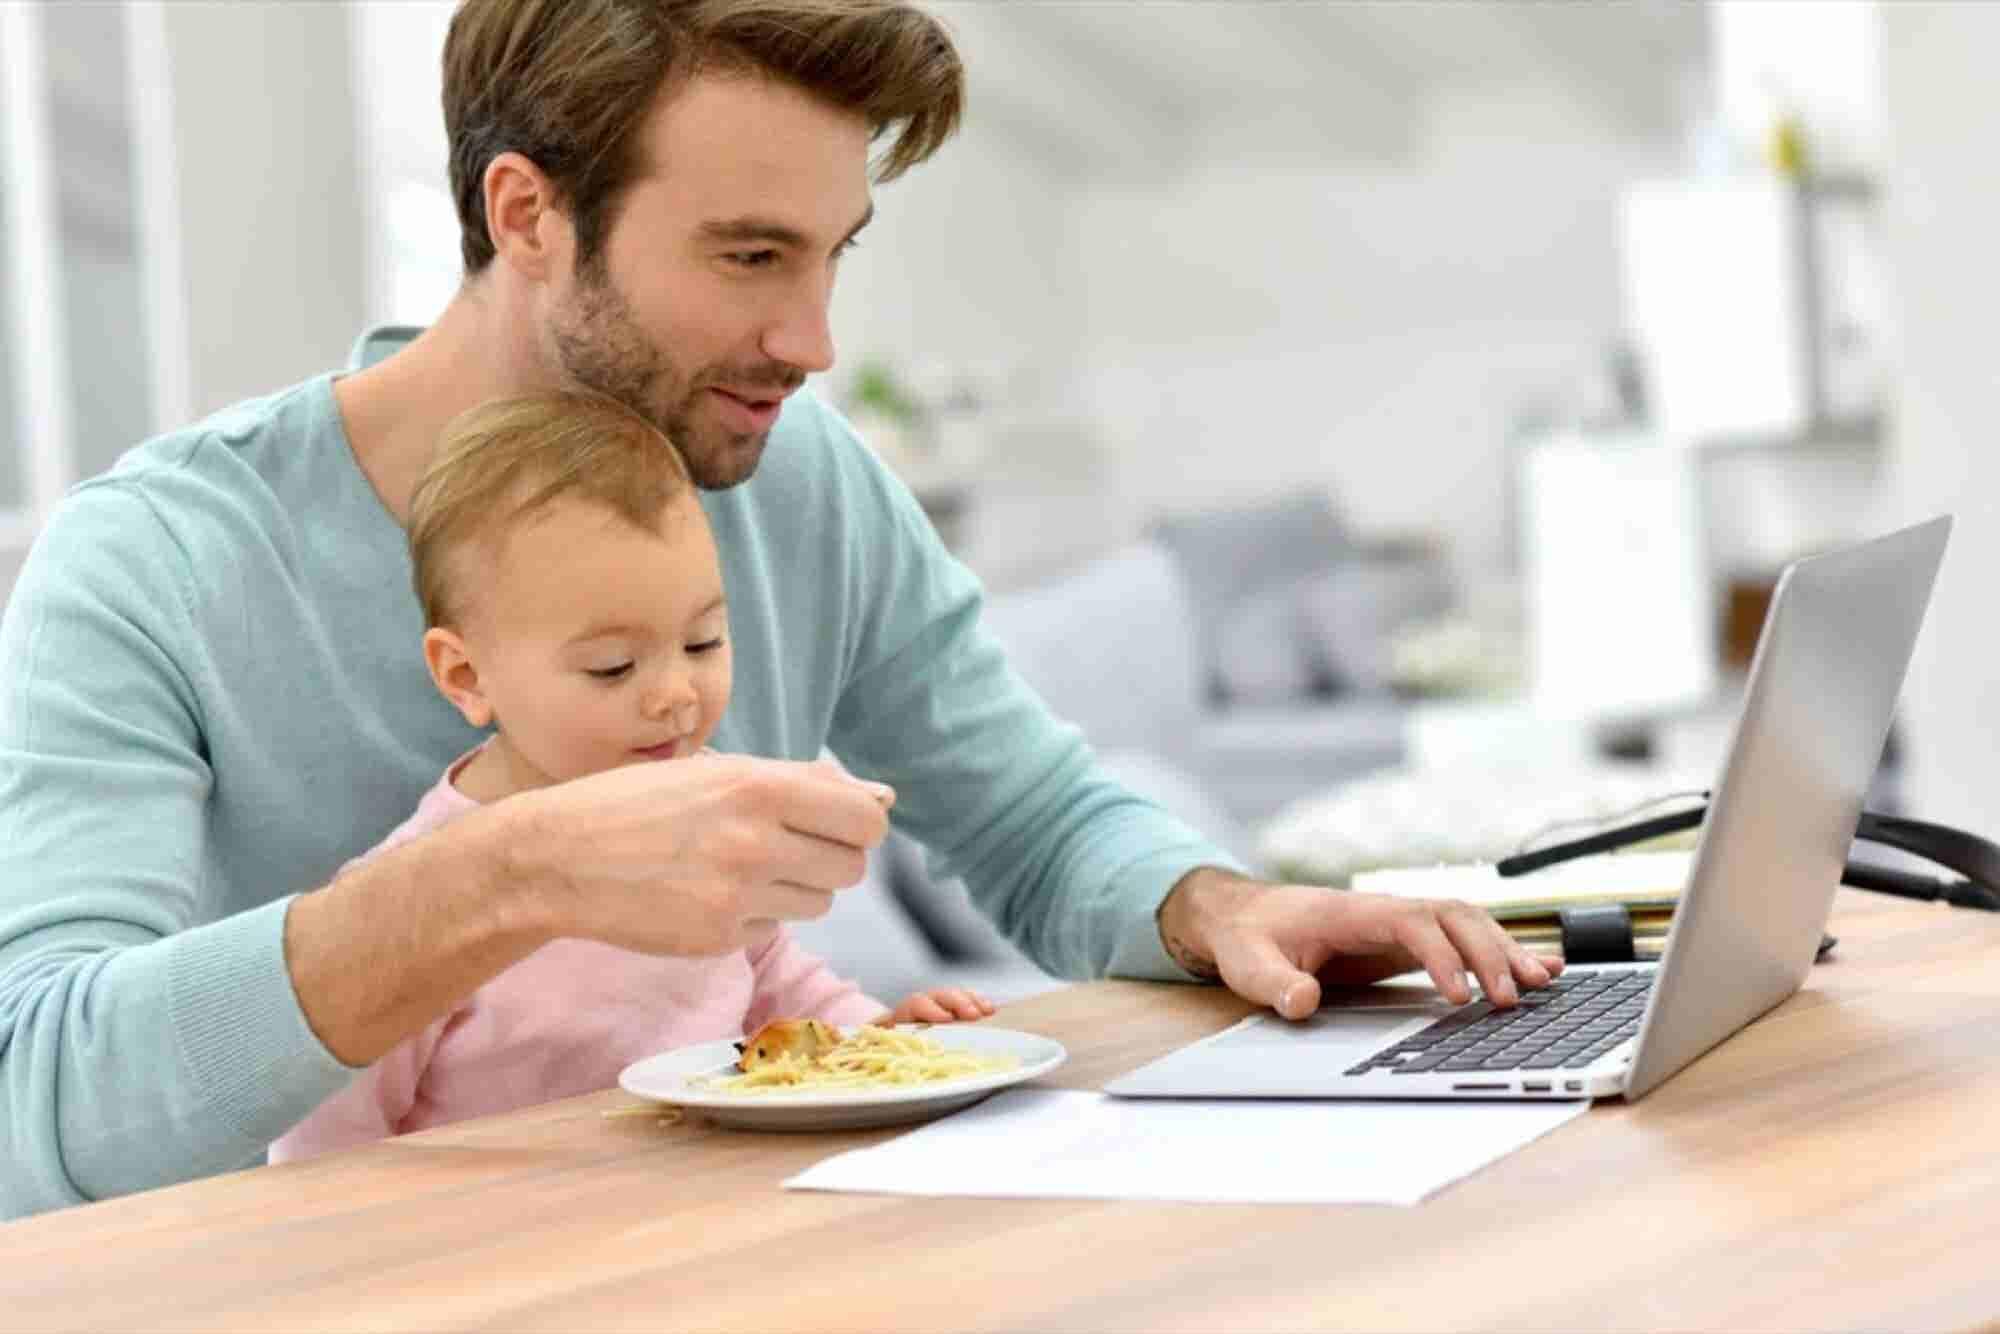 Father-preneurship: Story Of An Entrepreneur Dad!